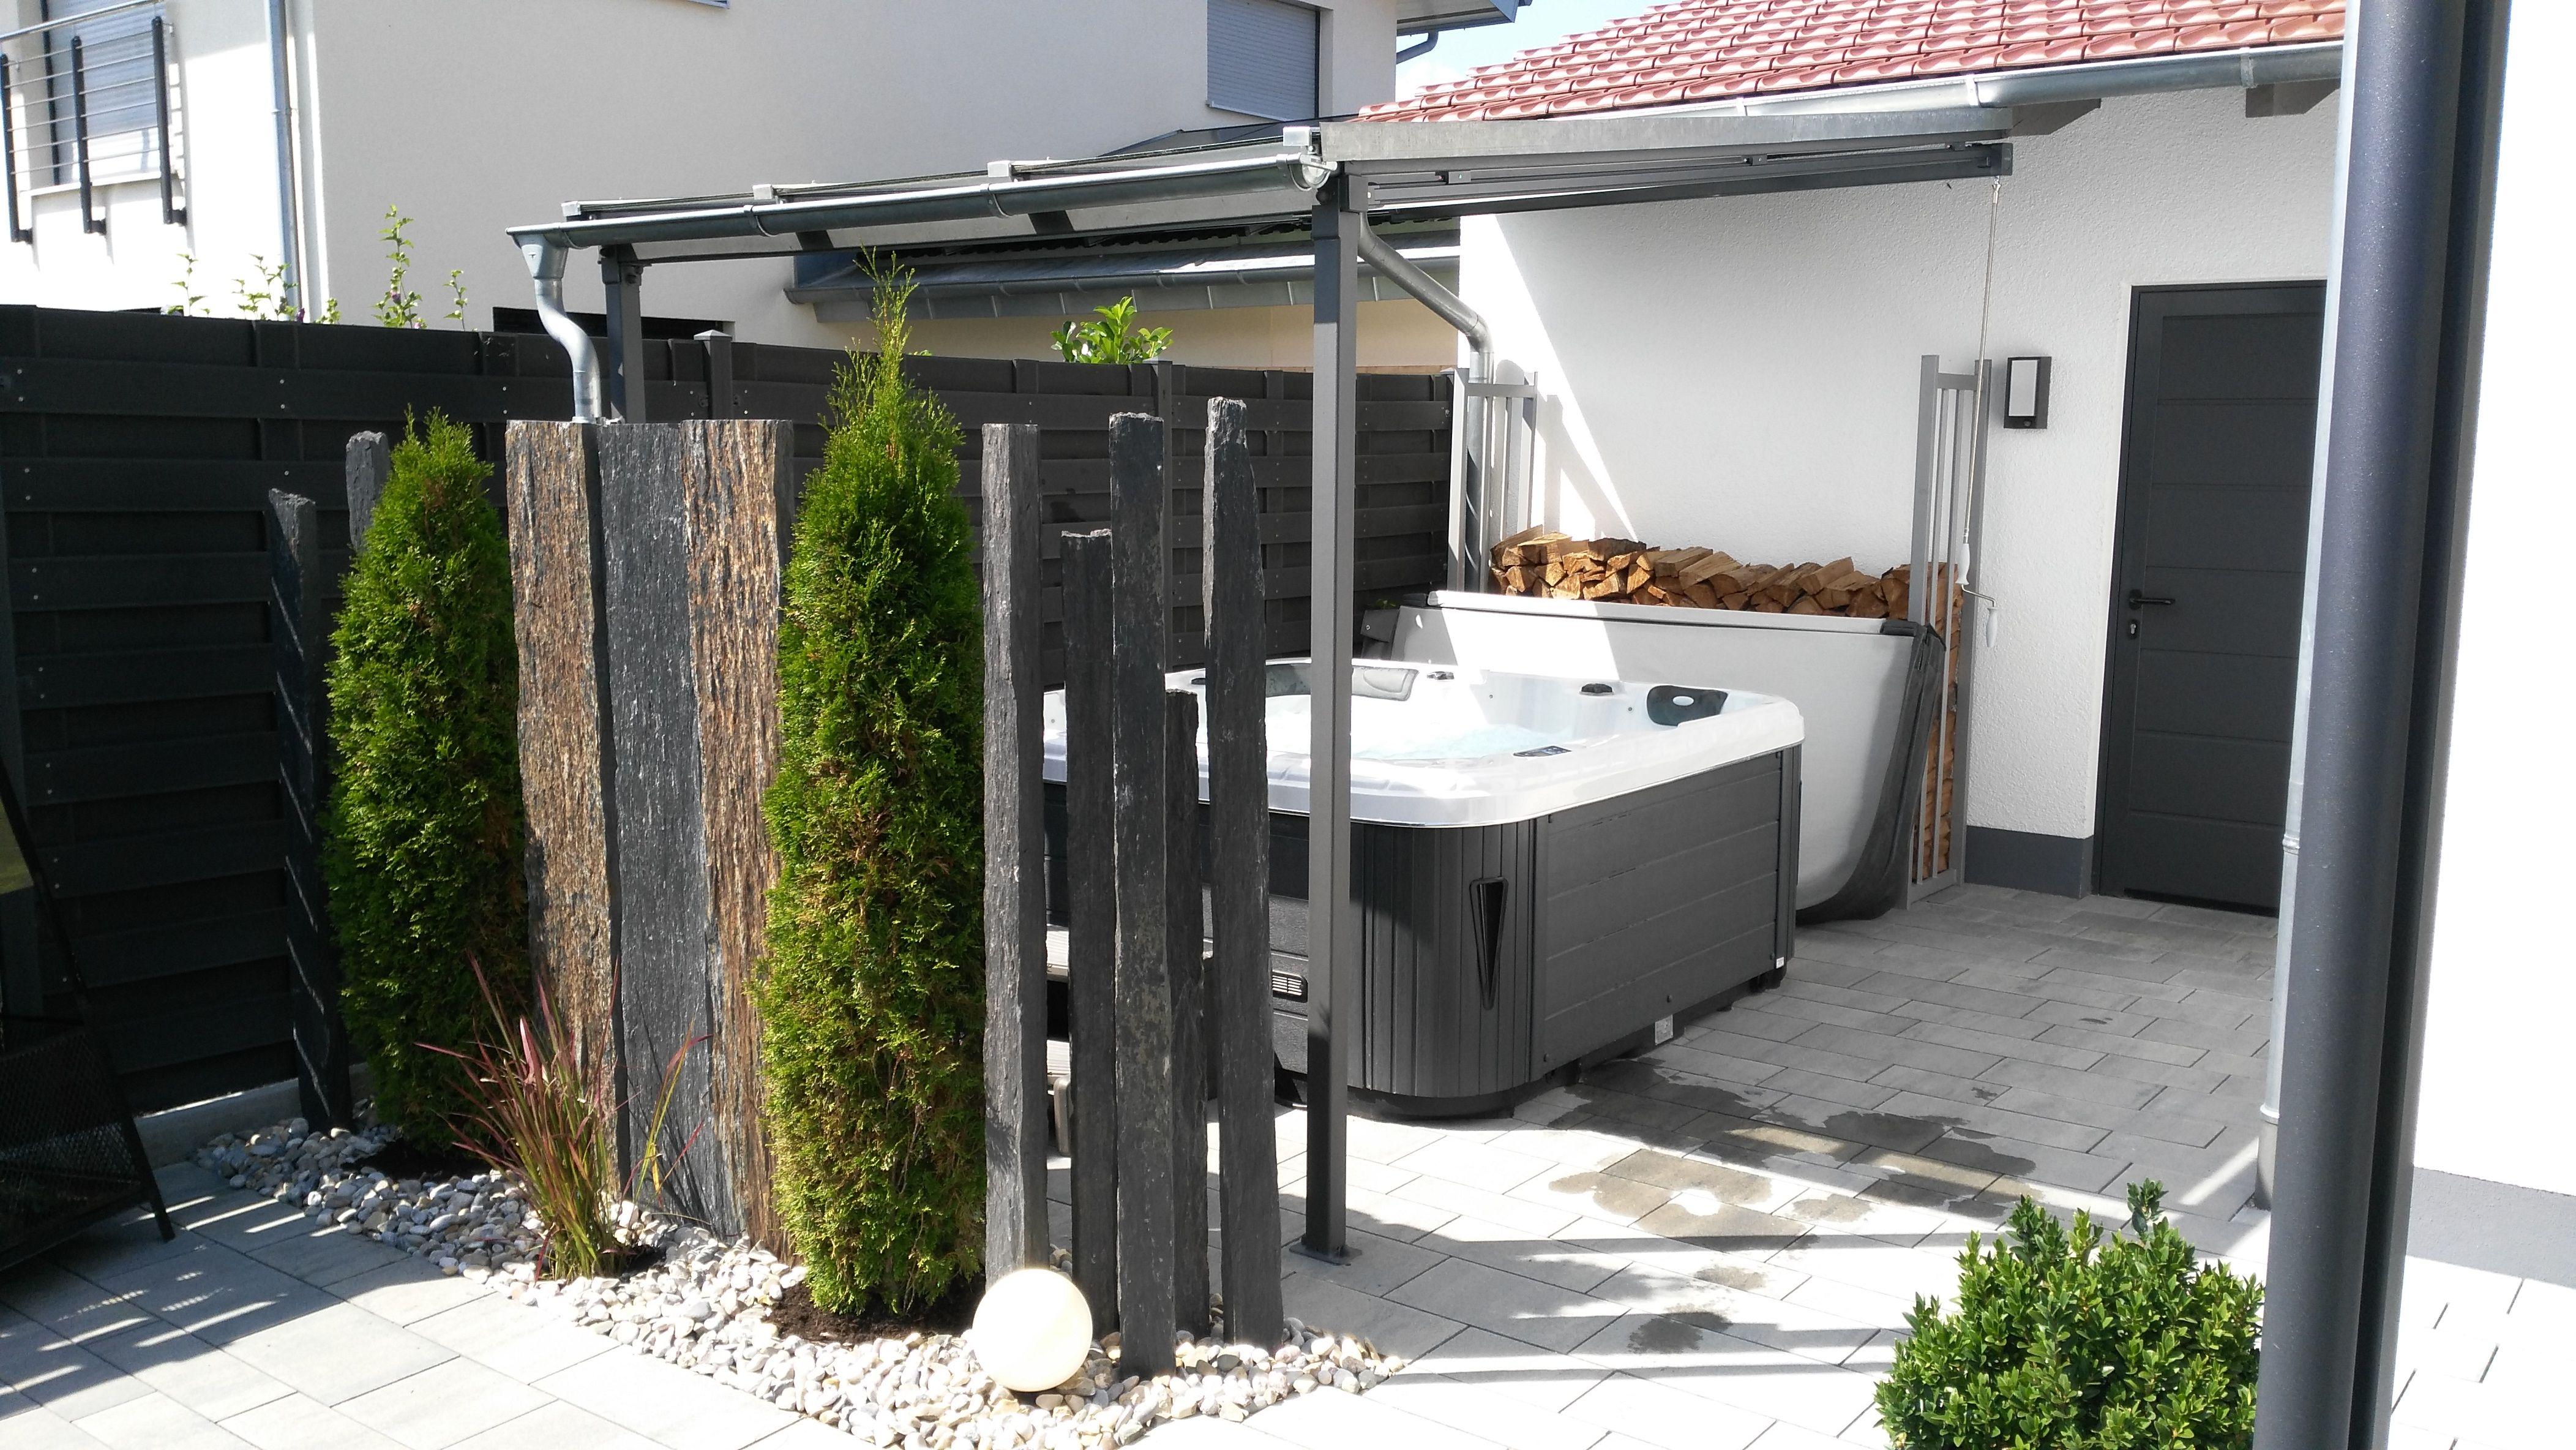 Schieferbretter 130 Whirlpool Terrasse Schiefer Aussengestaltung